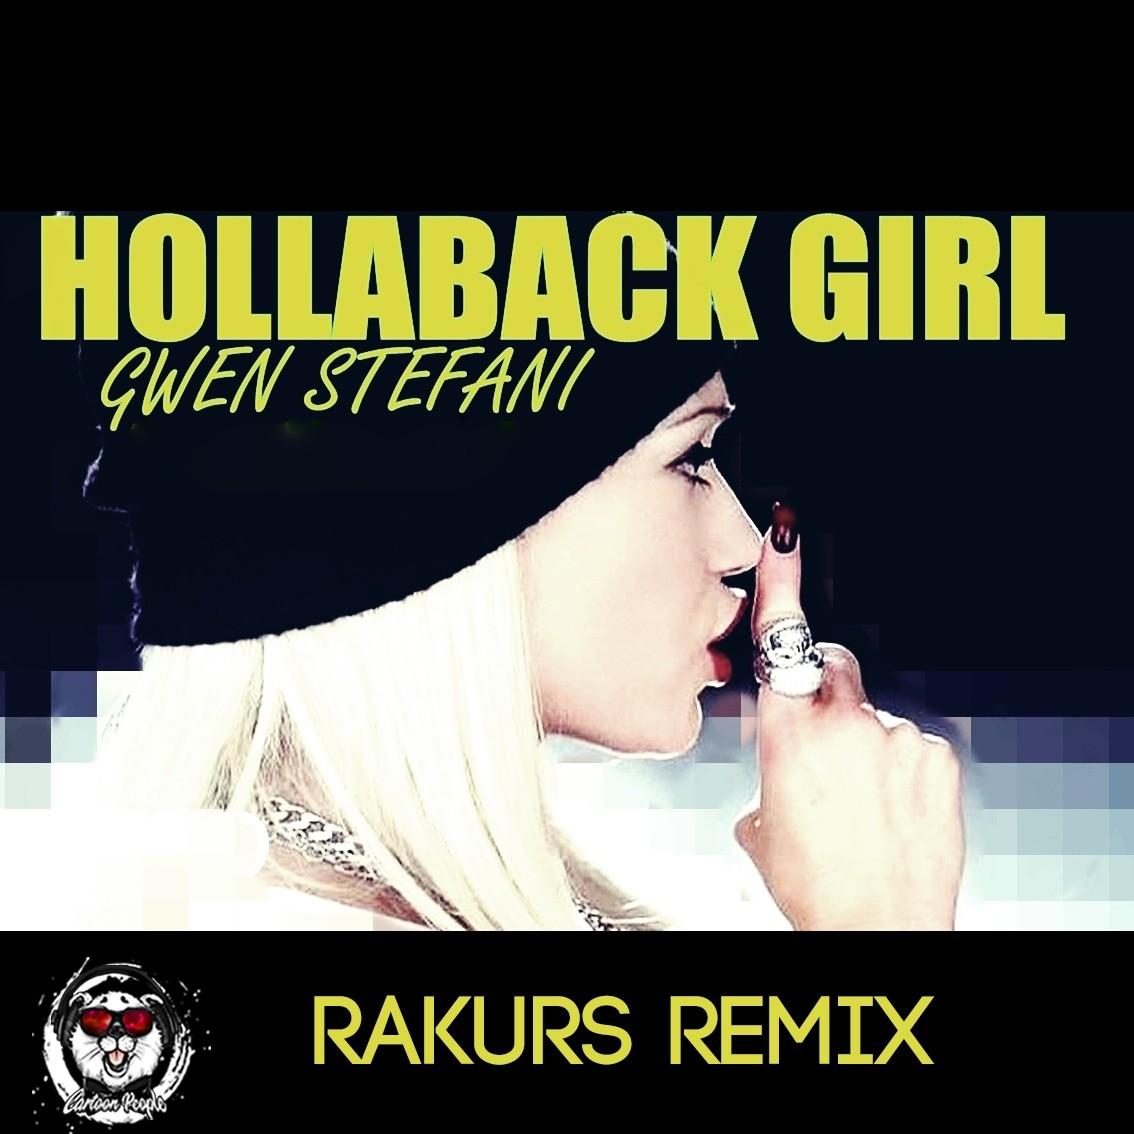 Gwen stefani hollaback girl gif on gifer by beanis.